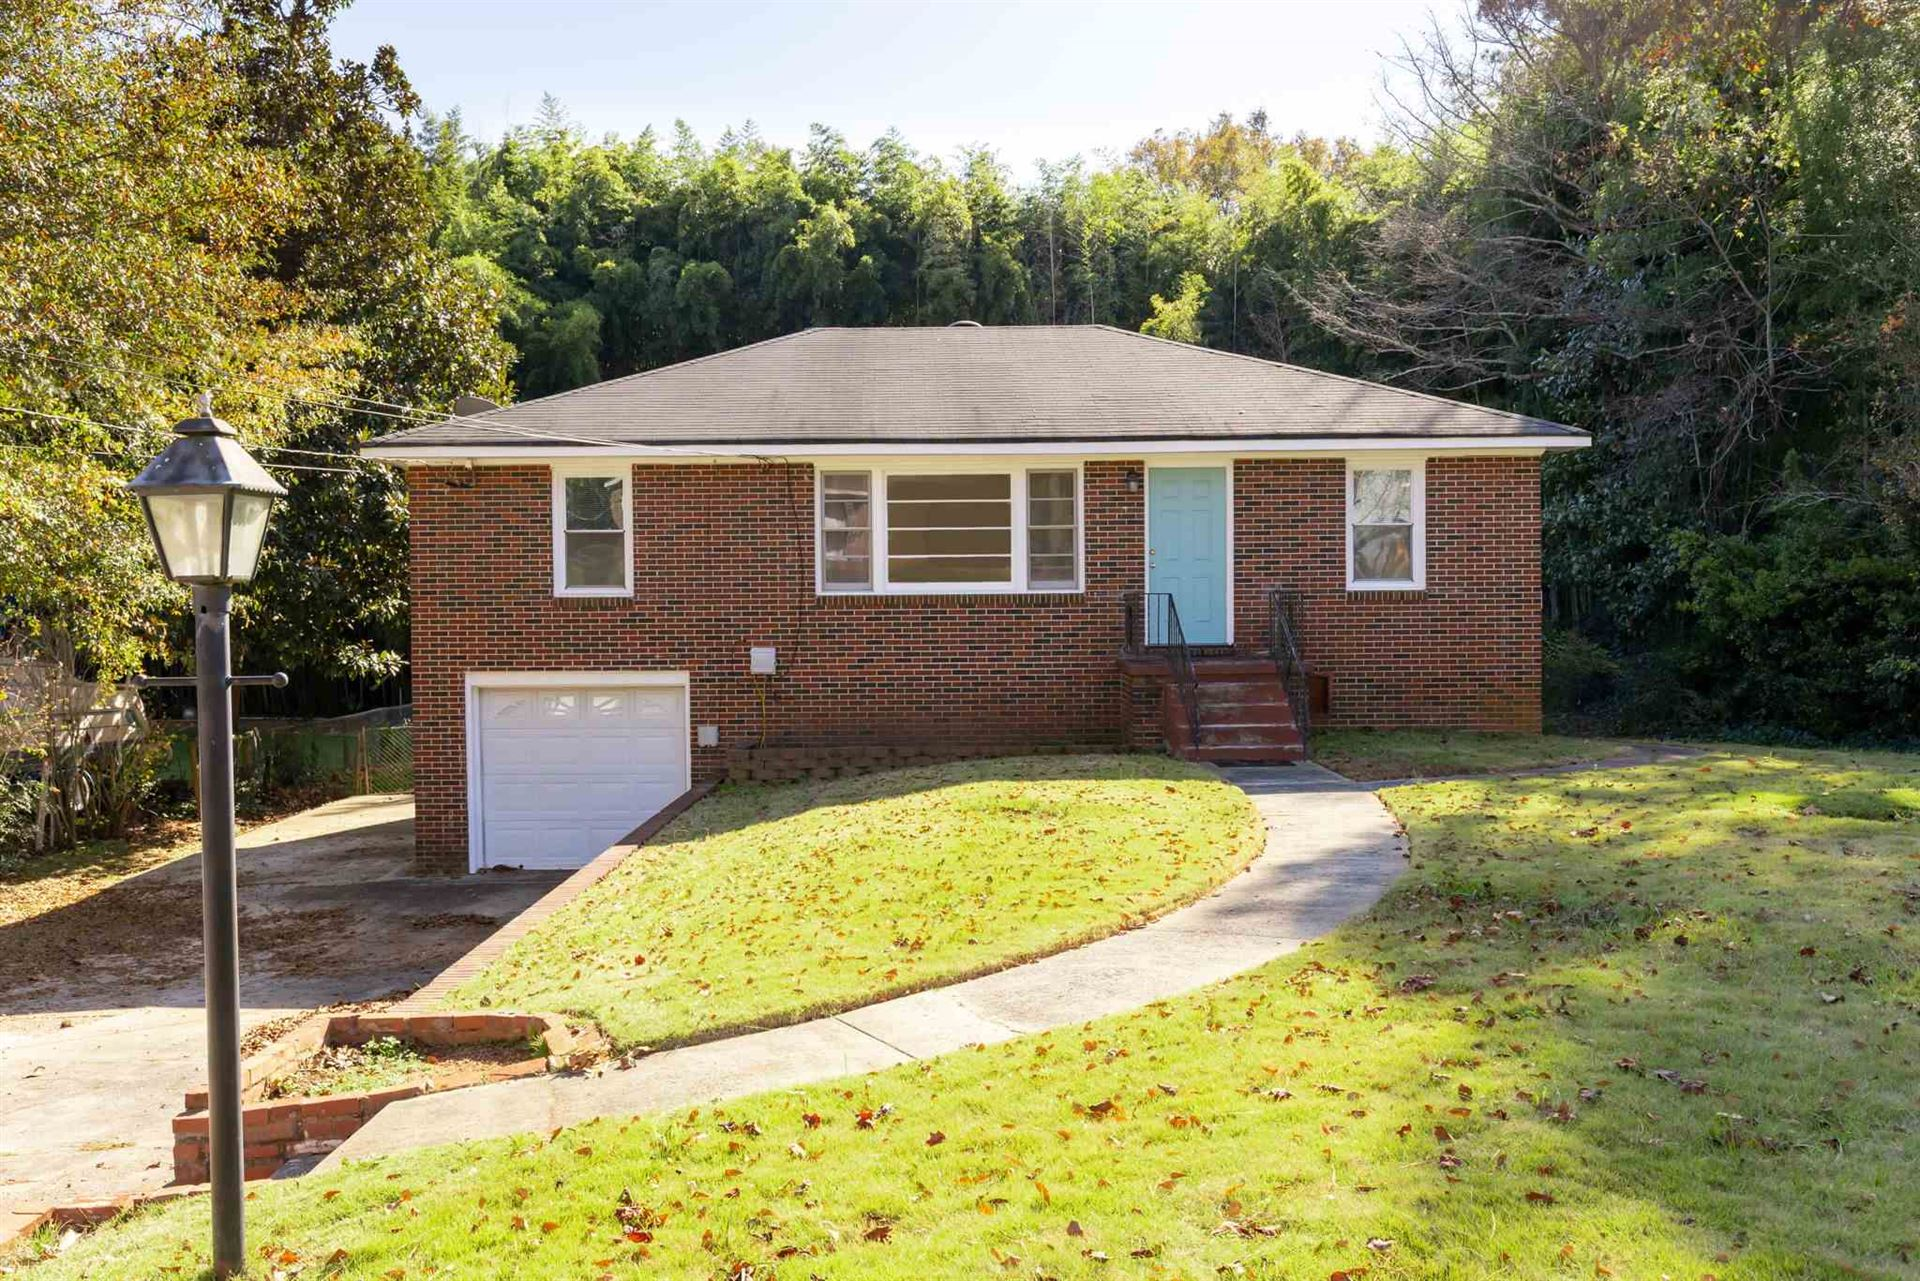 282 Church Rd, Smyrna, GA 30082 - MLS#: 8890888